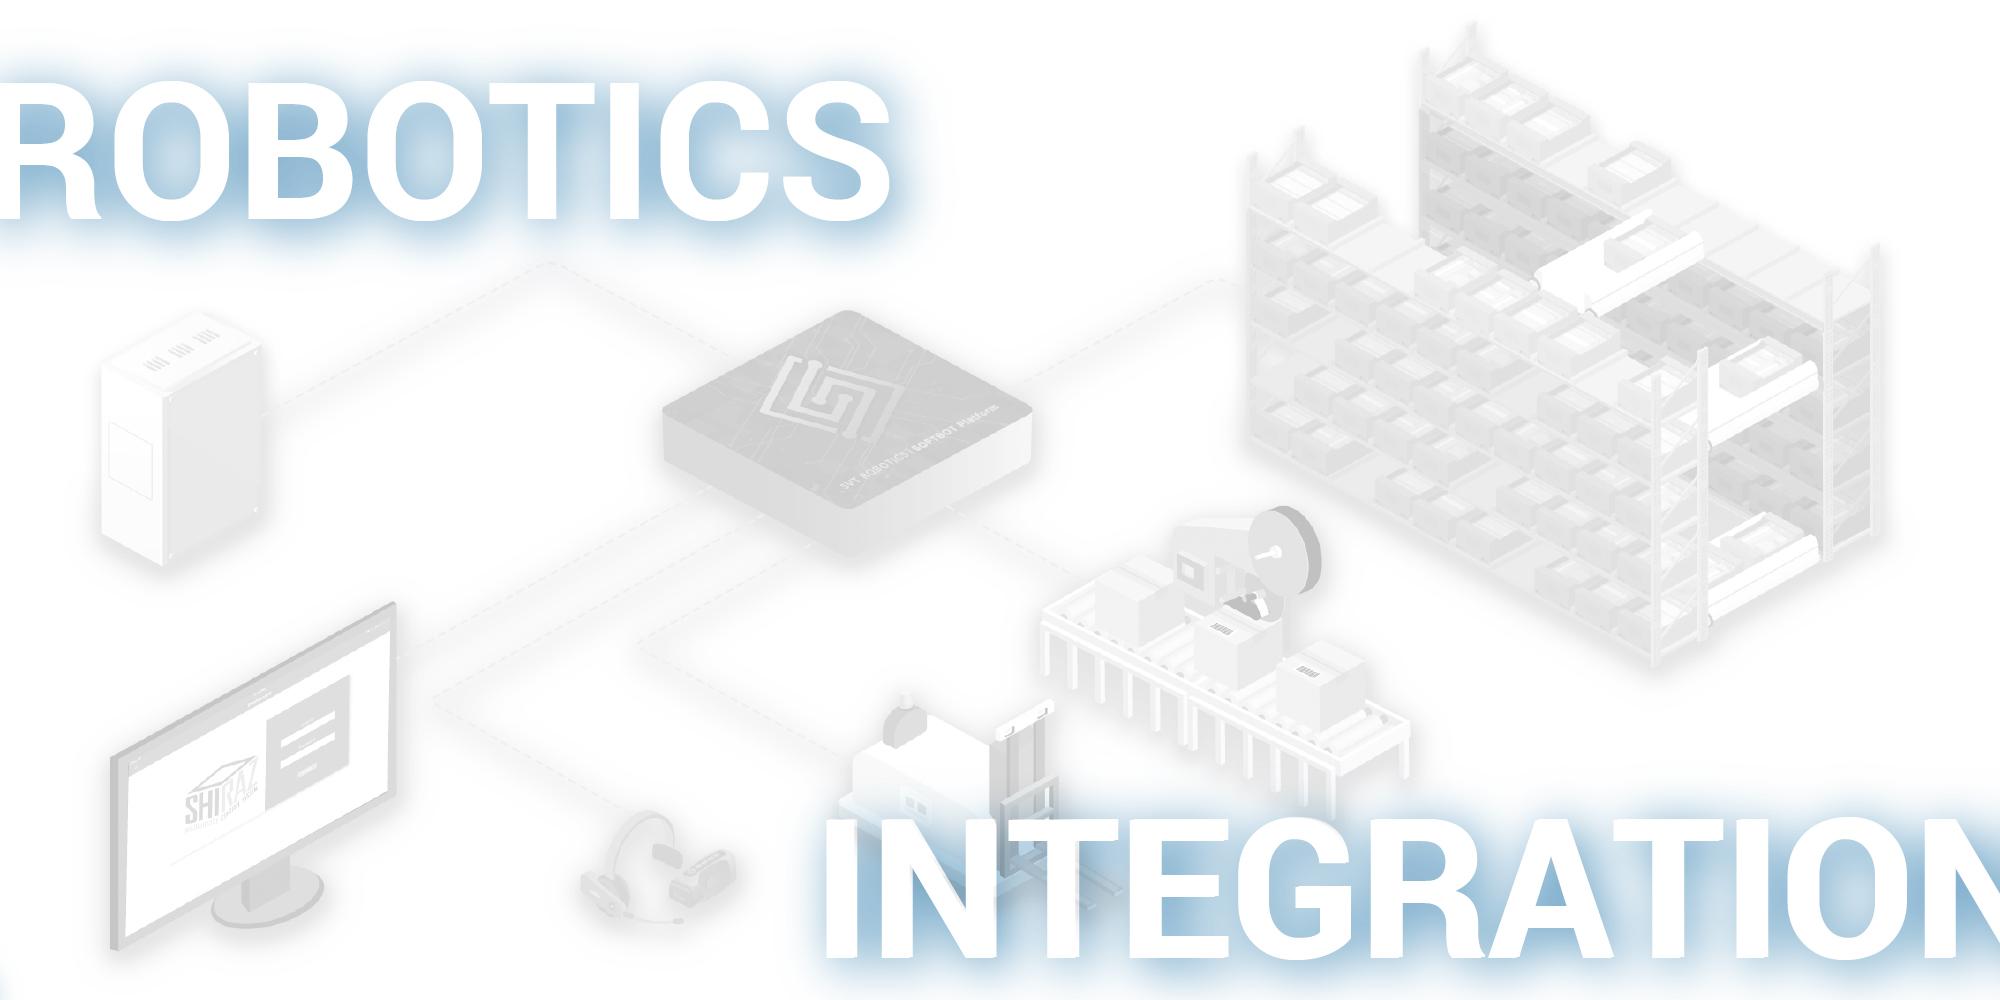 Re-envision Robotics Integration: 3 Steps to Success